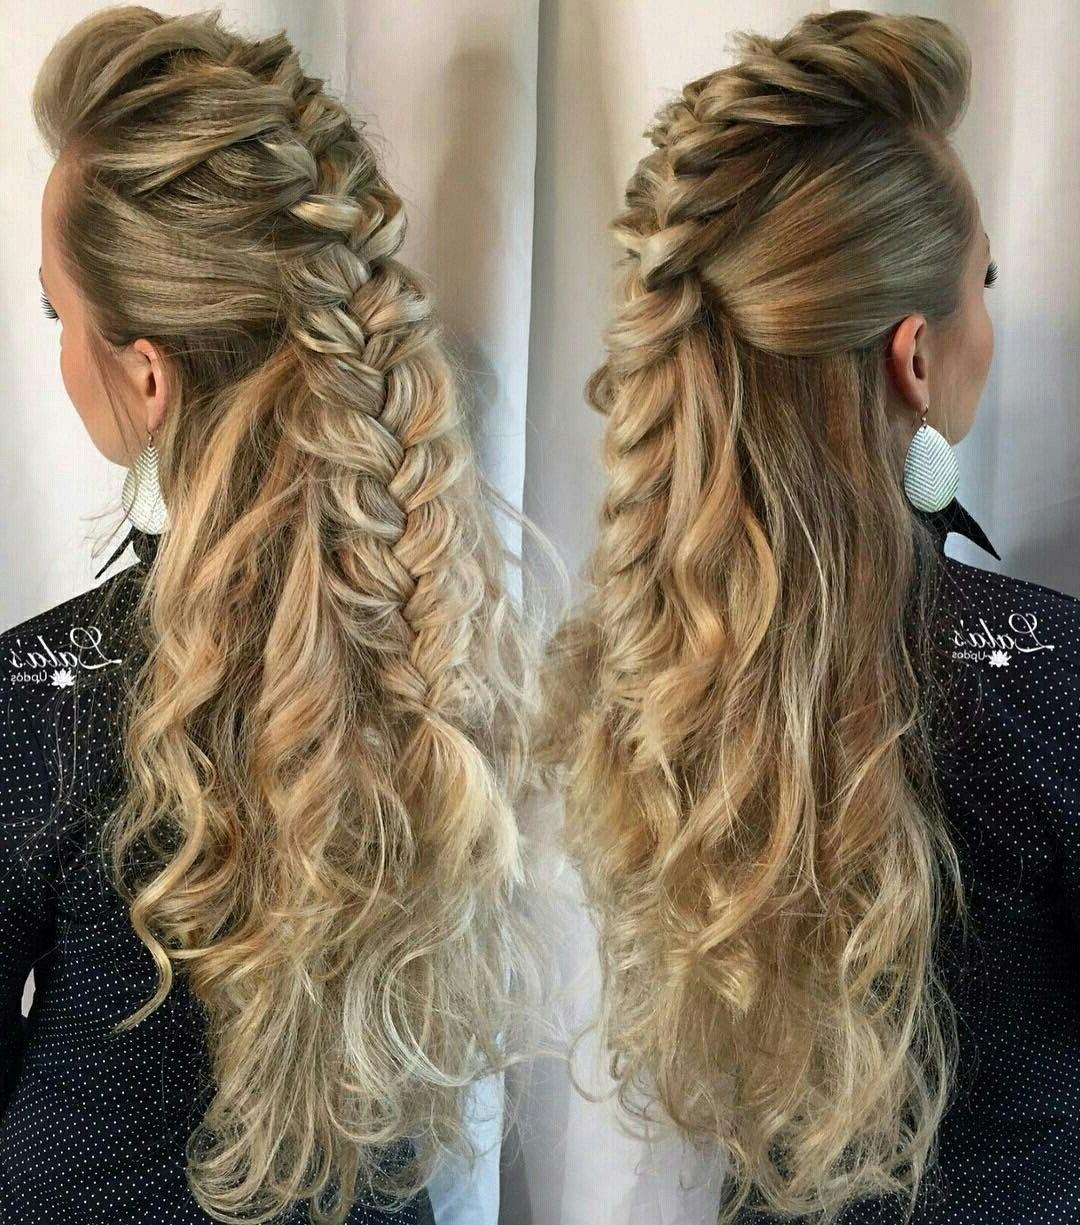 [%fashionable Faux Hawk Ponytail Hairstyles Throughout Mohawk Braid Half Updo | Ideas De Peinado | Moños | Trenzas [hairdo|mohawk Braid Half Updo | Ideas De Peinado | Moños | Trenzas [hairdo Pertaining To Most Recently Released Faux Hawk Ponytail Hairstyles%] (View 15 of 20)